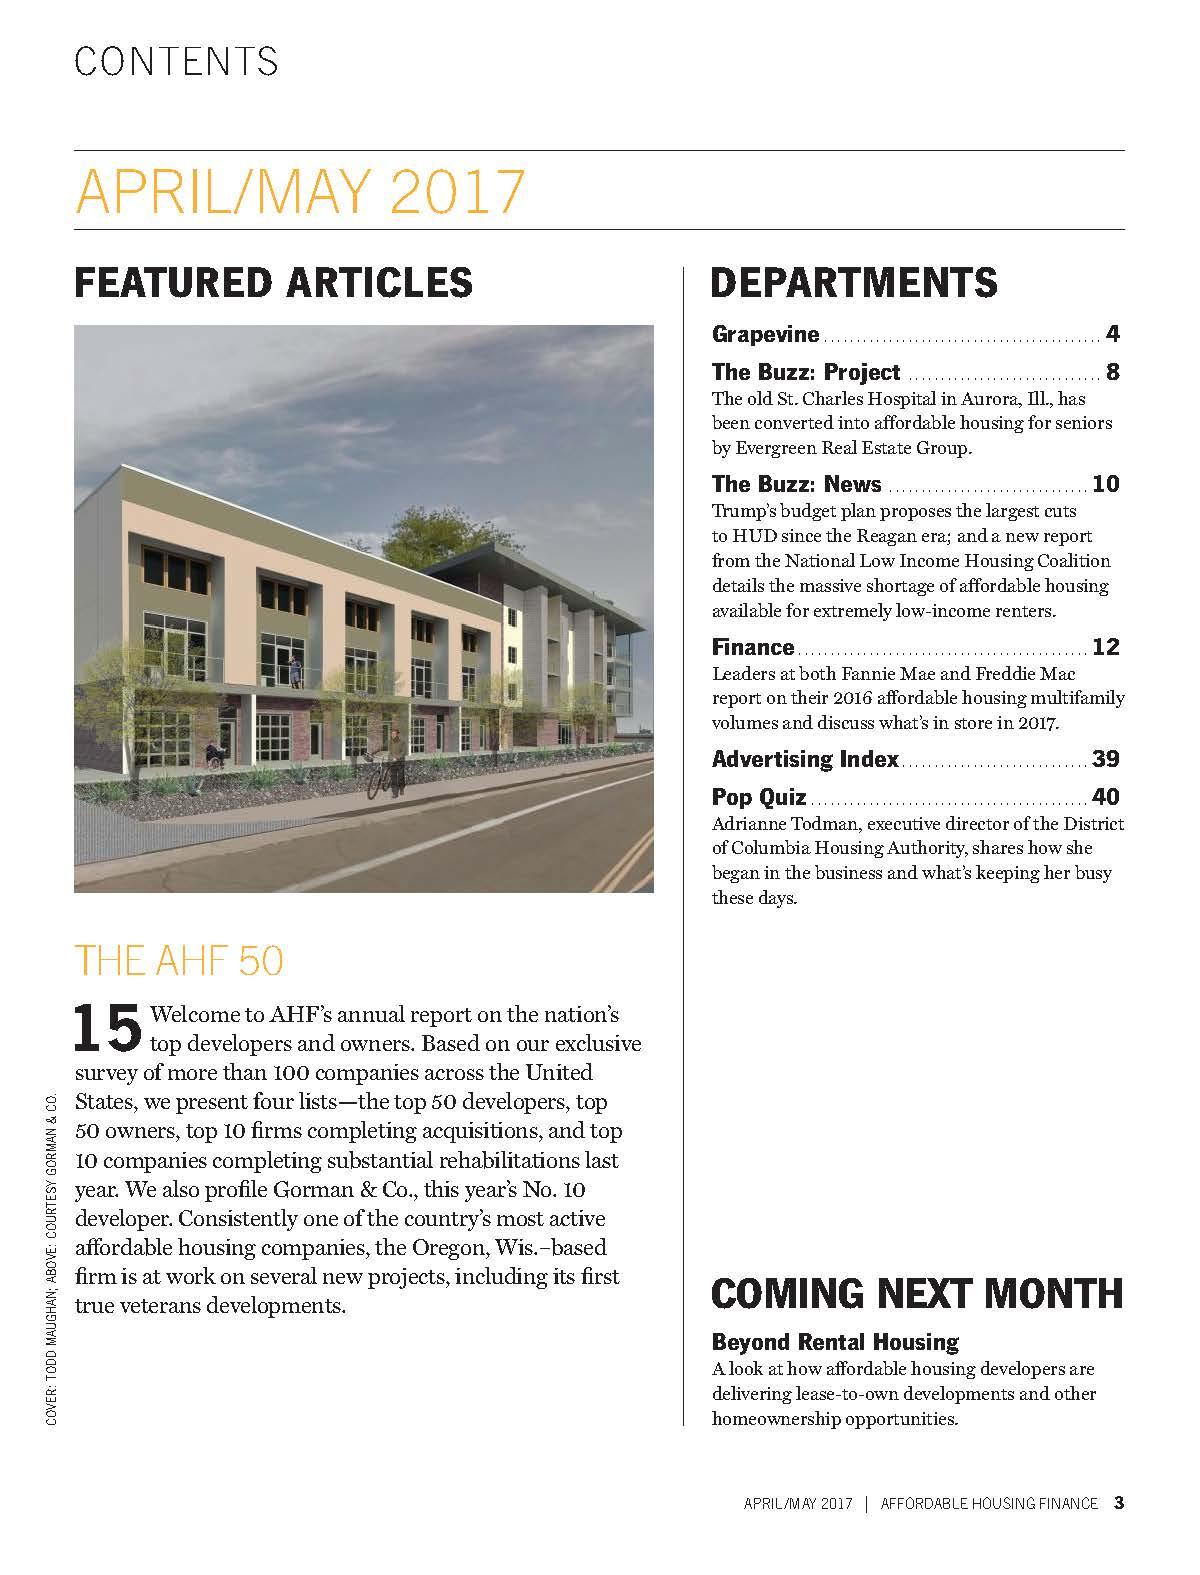 2016 AHF Top 50 Magazine - Madhouse Development